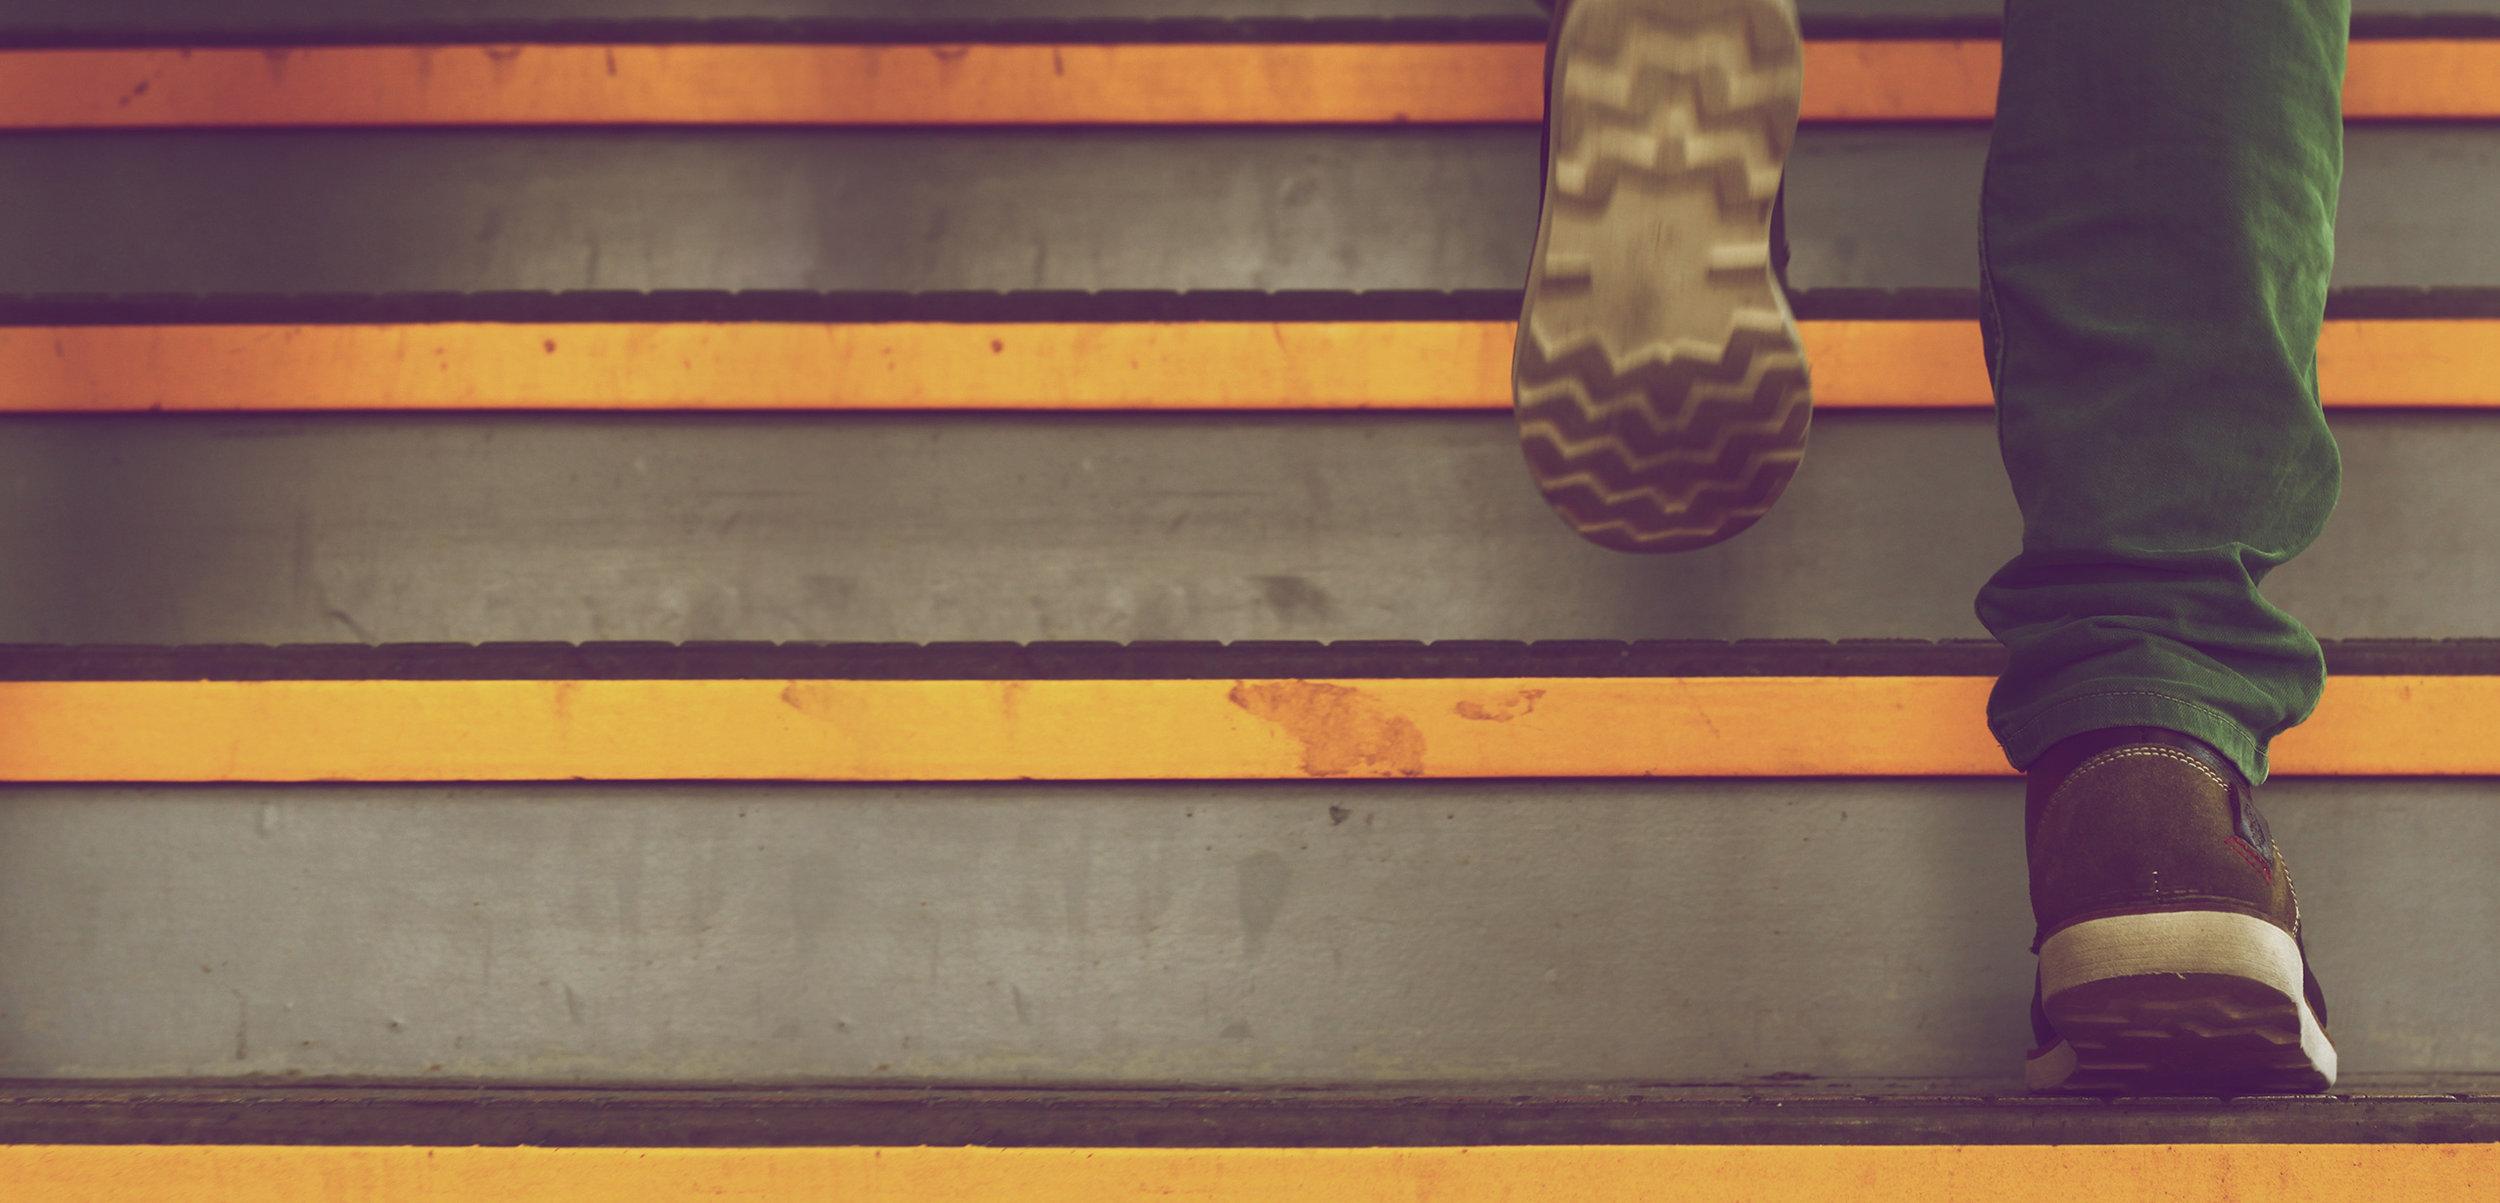 Steps_LR.jpg